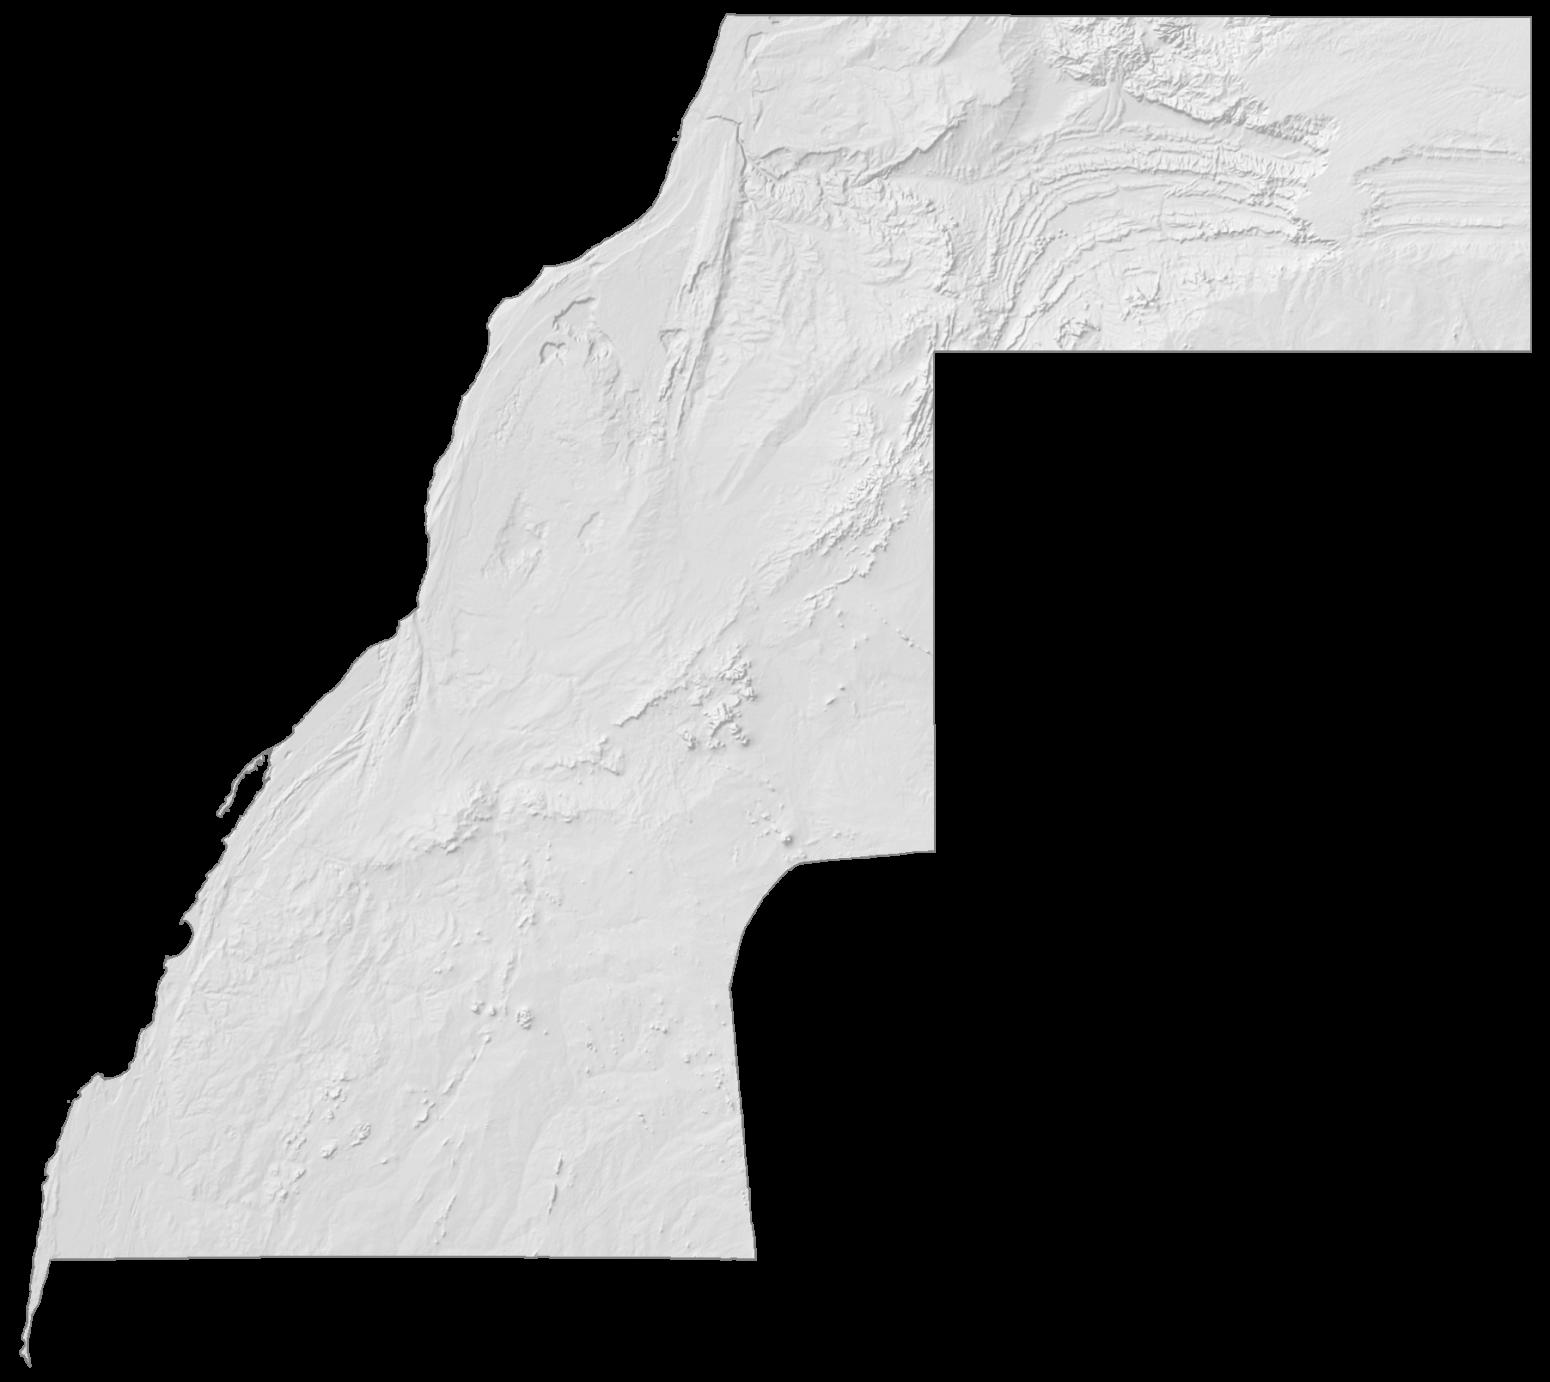 Western Sahara Elevation Map